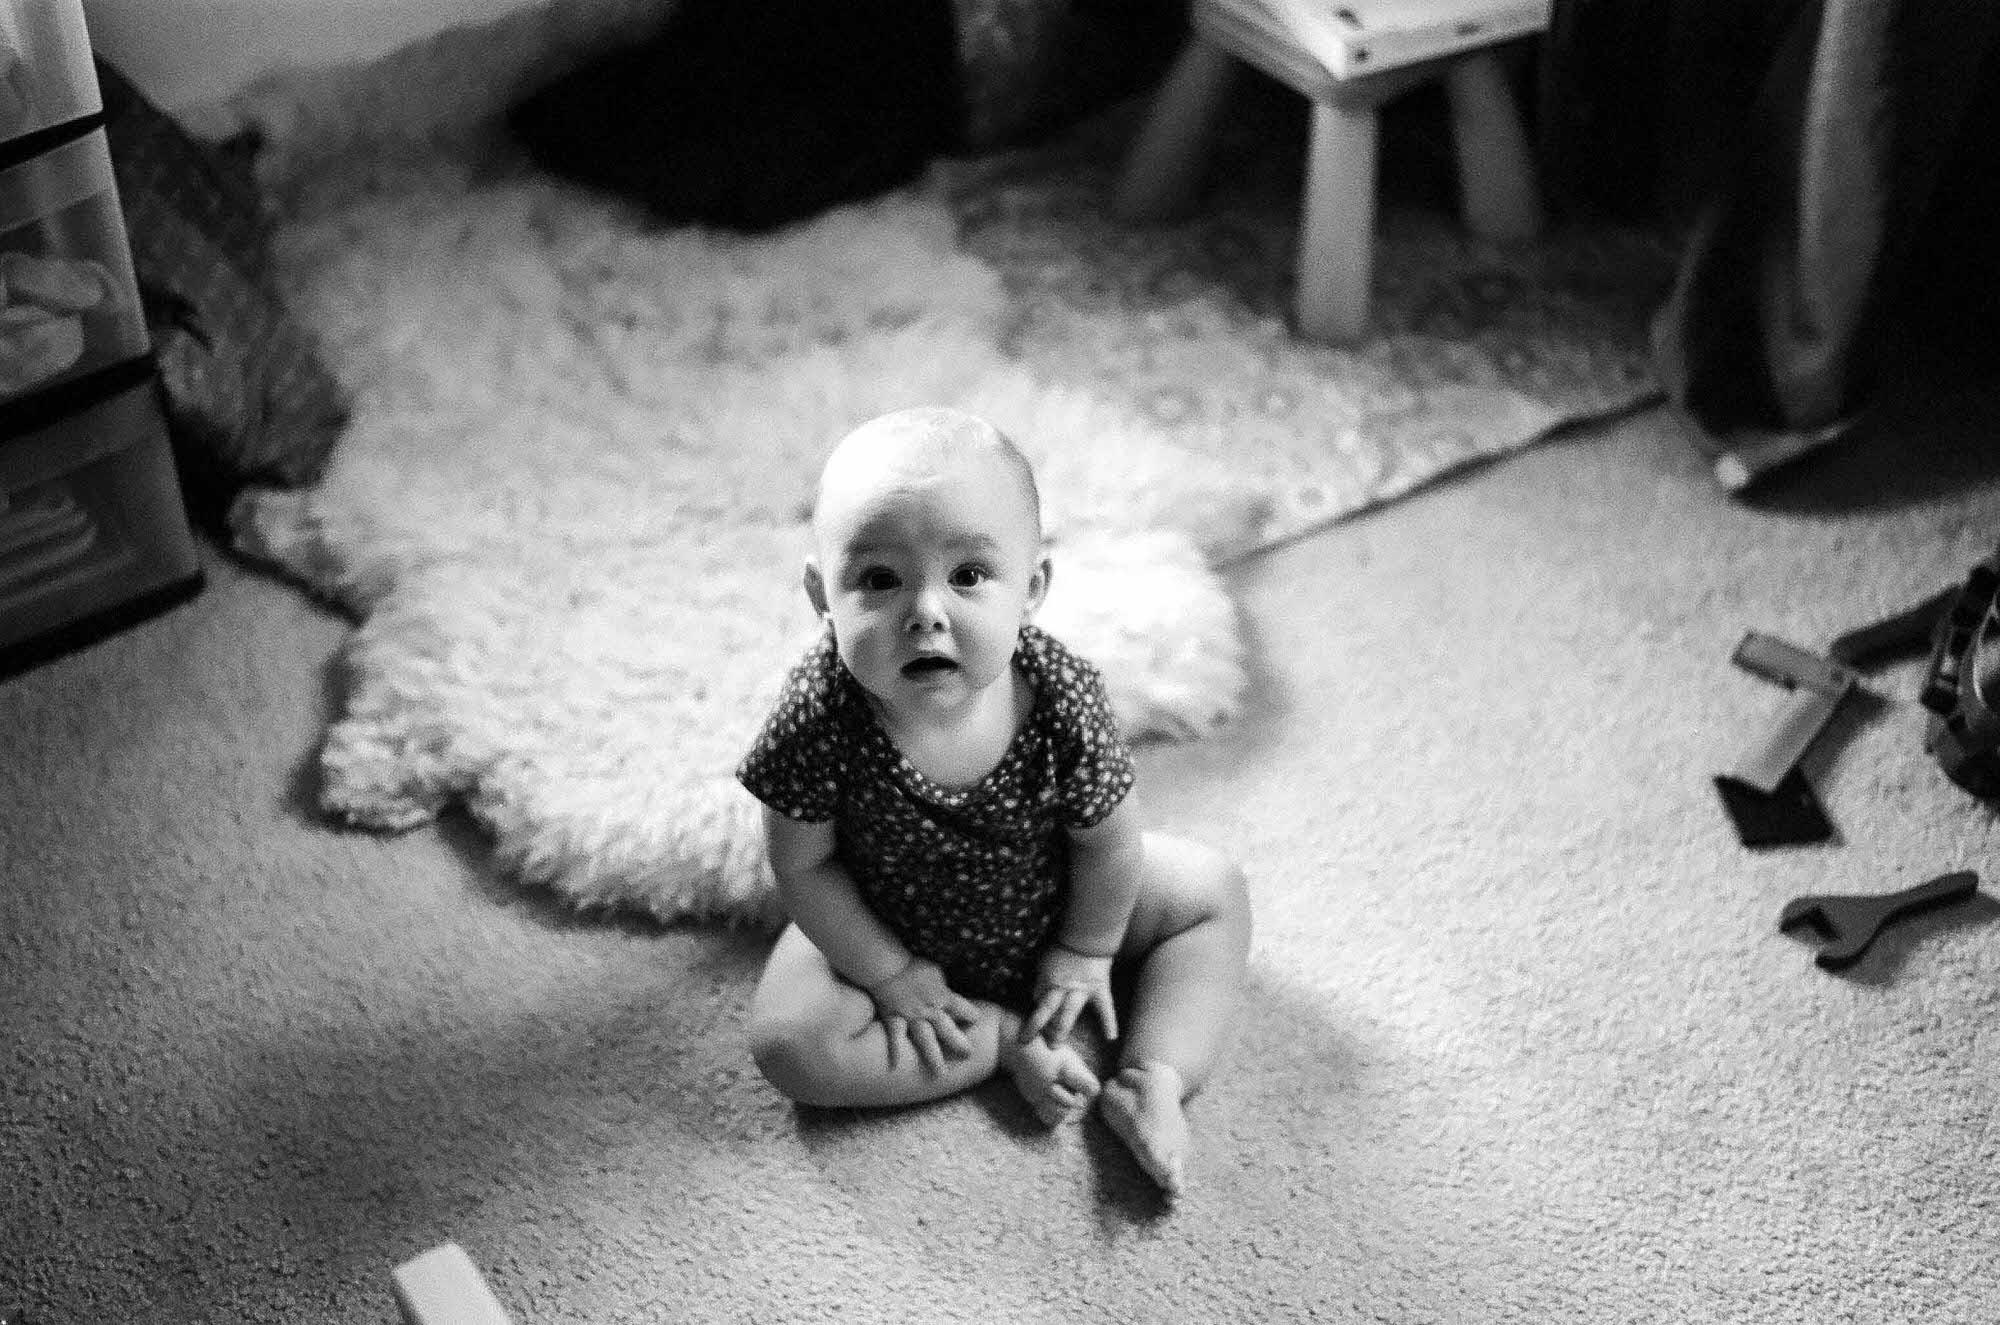 brandon-lovejoy-nikon-f5-35mm-film-camera-film-objektiv-100-words-8.jpg